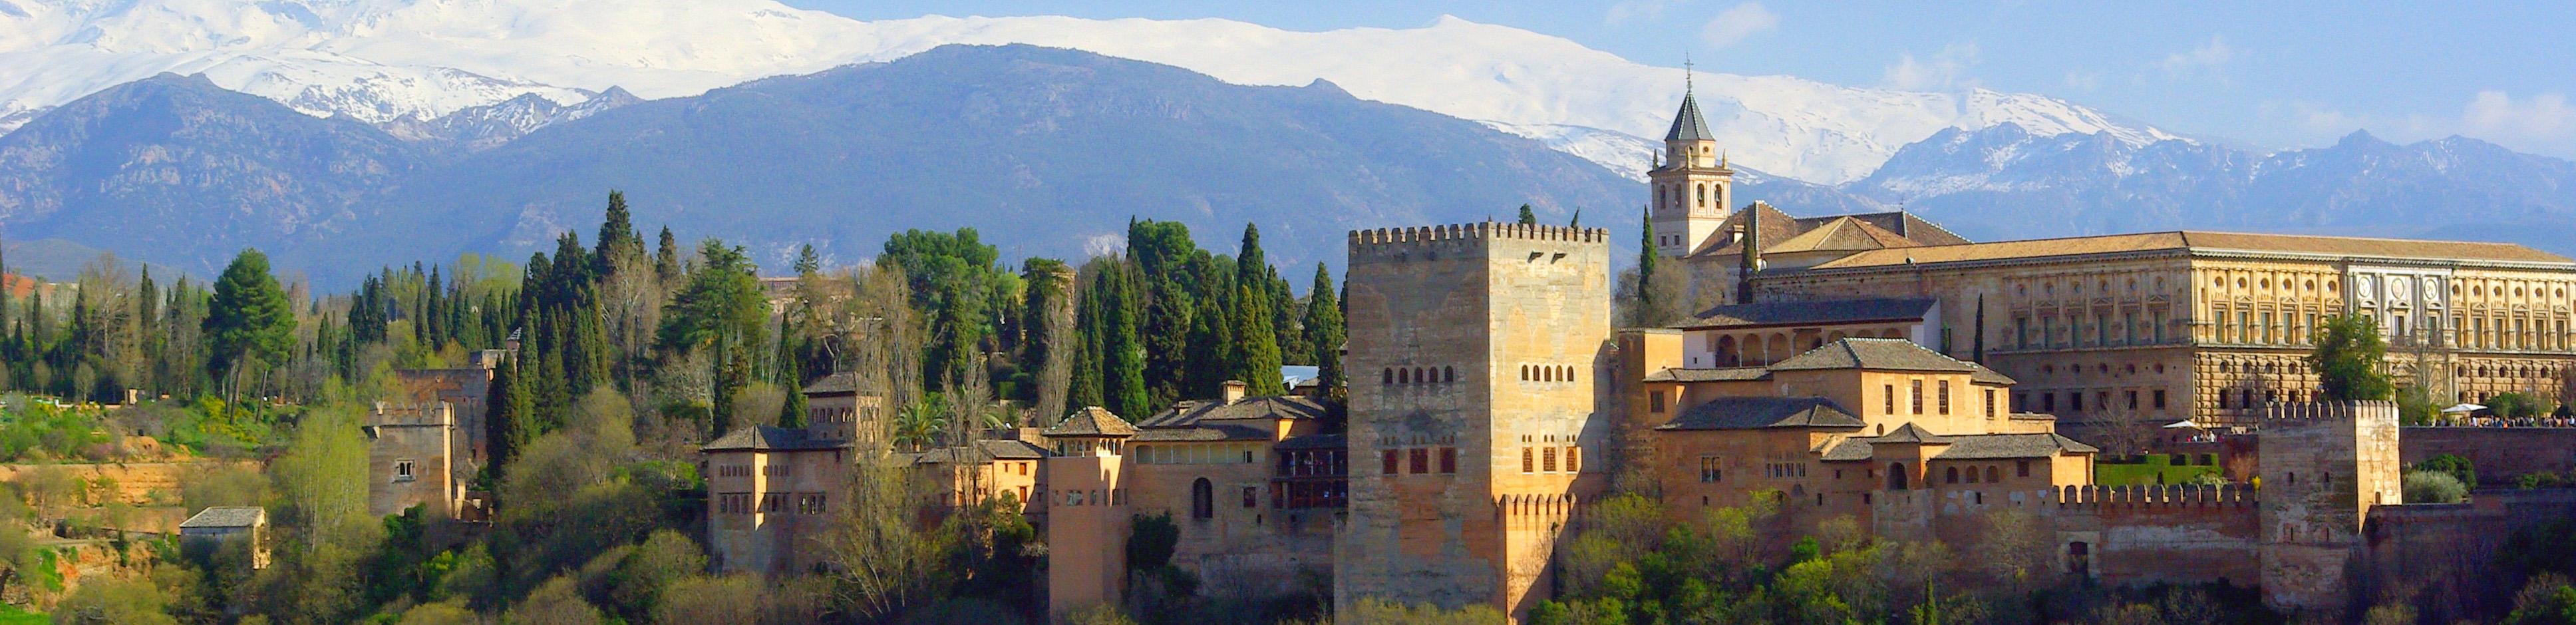 Alhambra-from-Mirador-San-Nicolas2